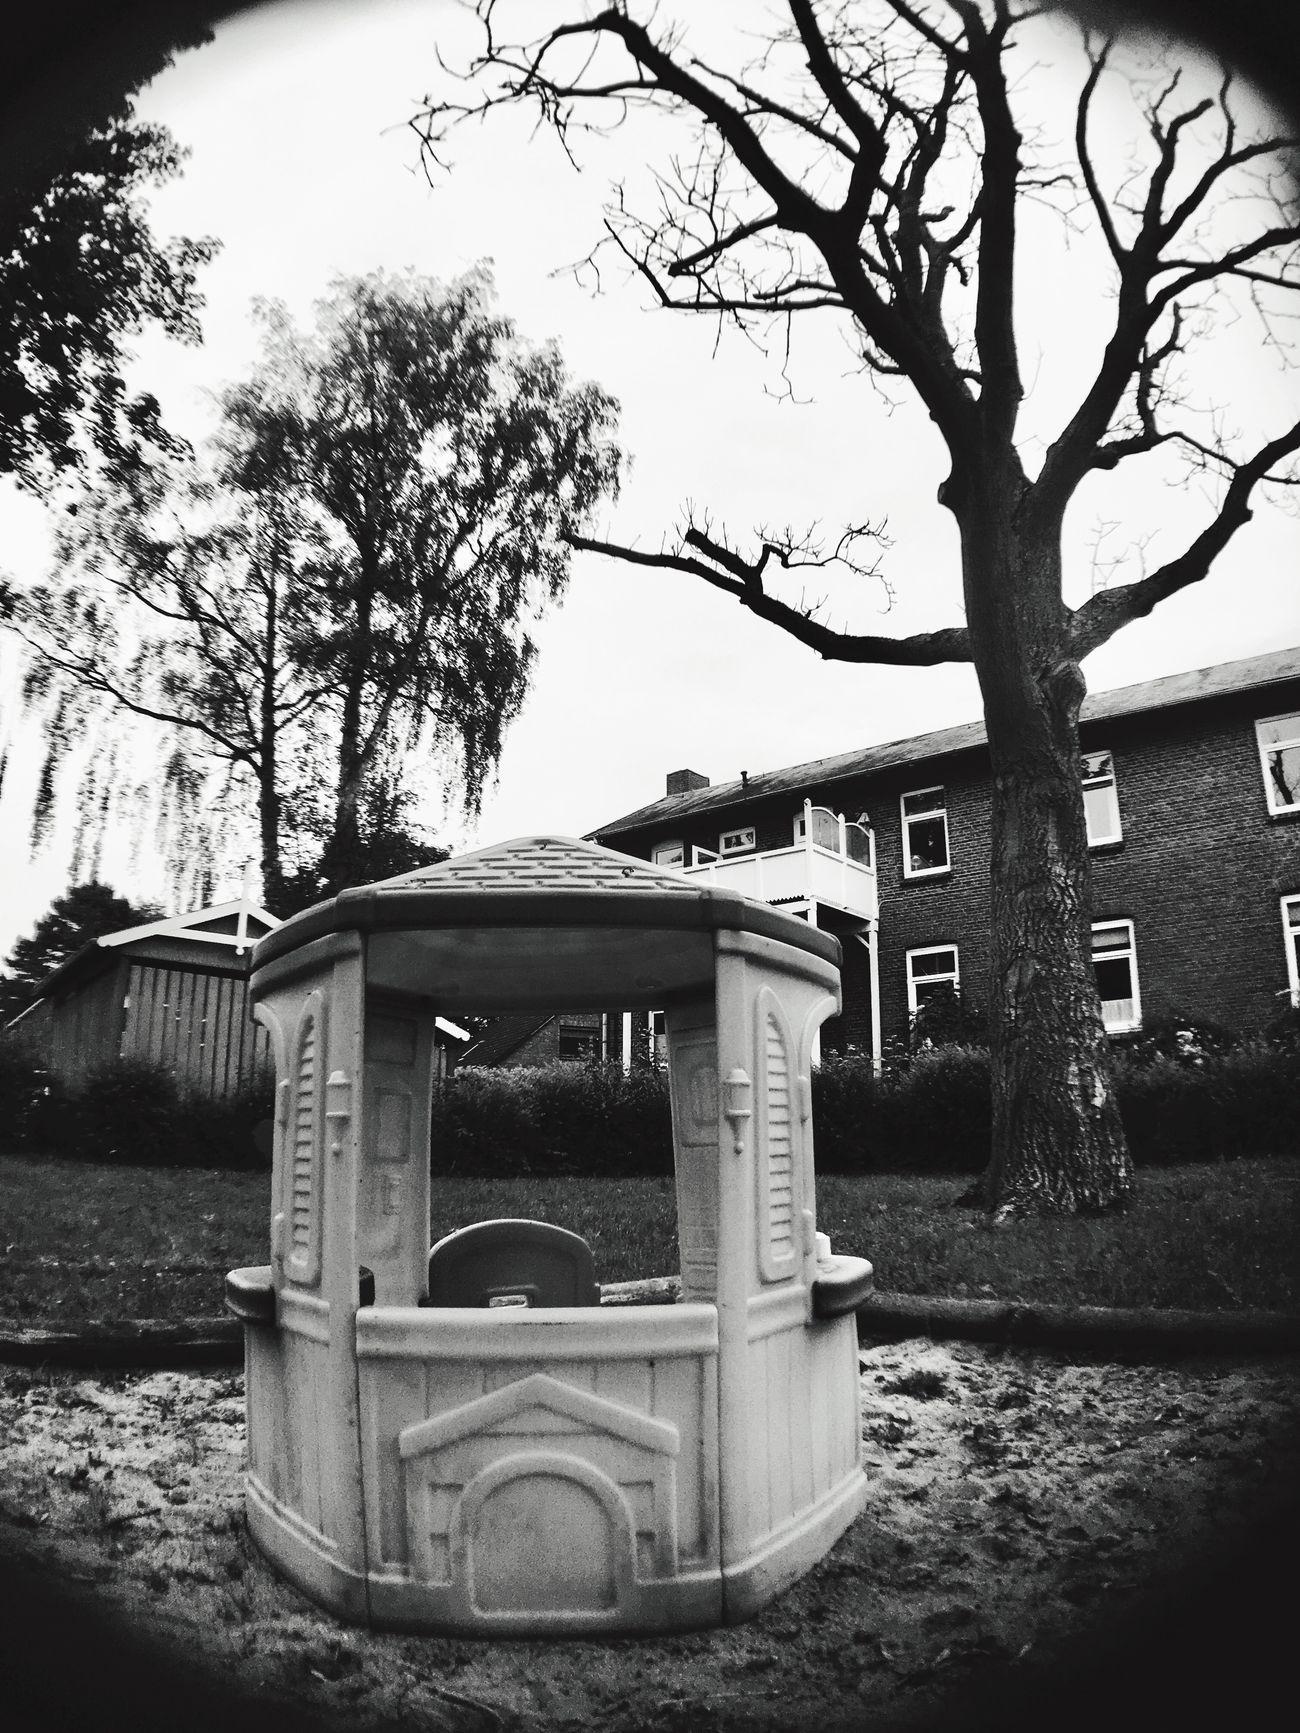 Built Structure Wide Angle Iphonese aBare Tree uOutdoors oNo People rTree aNature lPlayground aSandbox iKids House